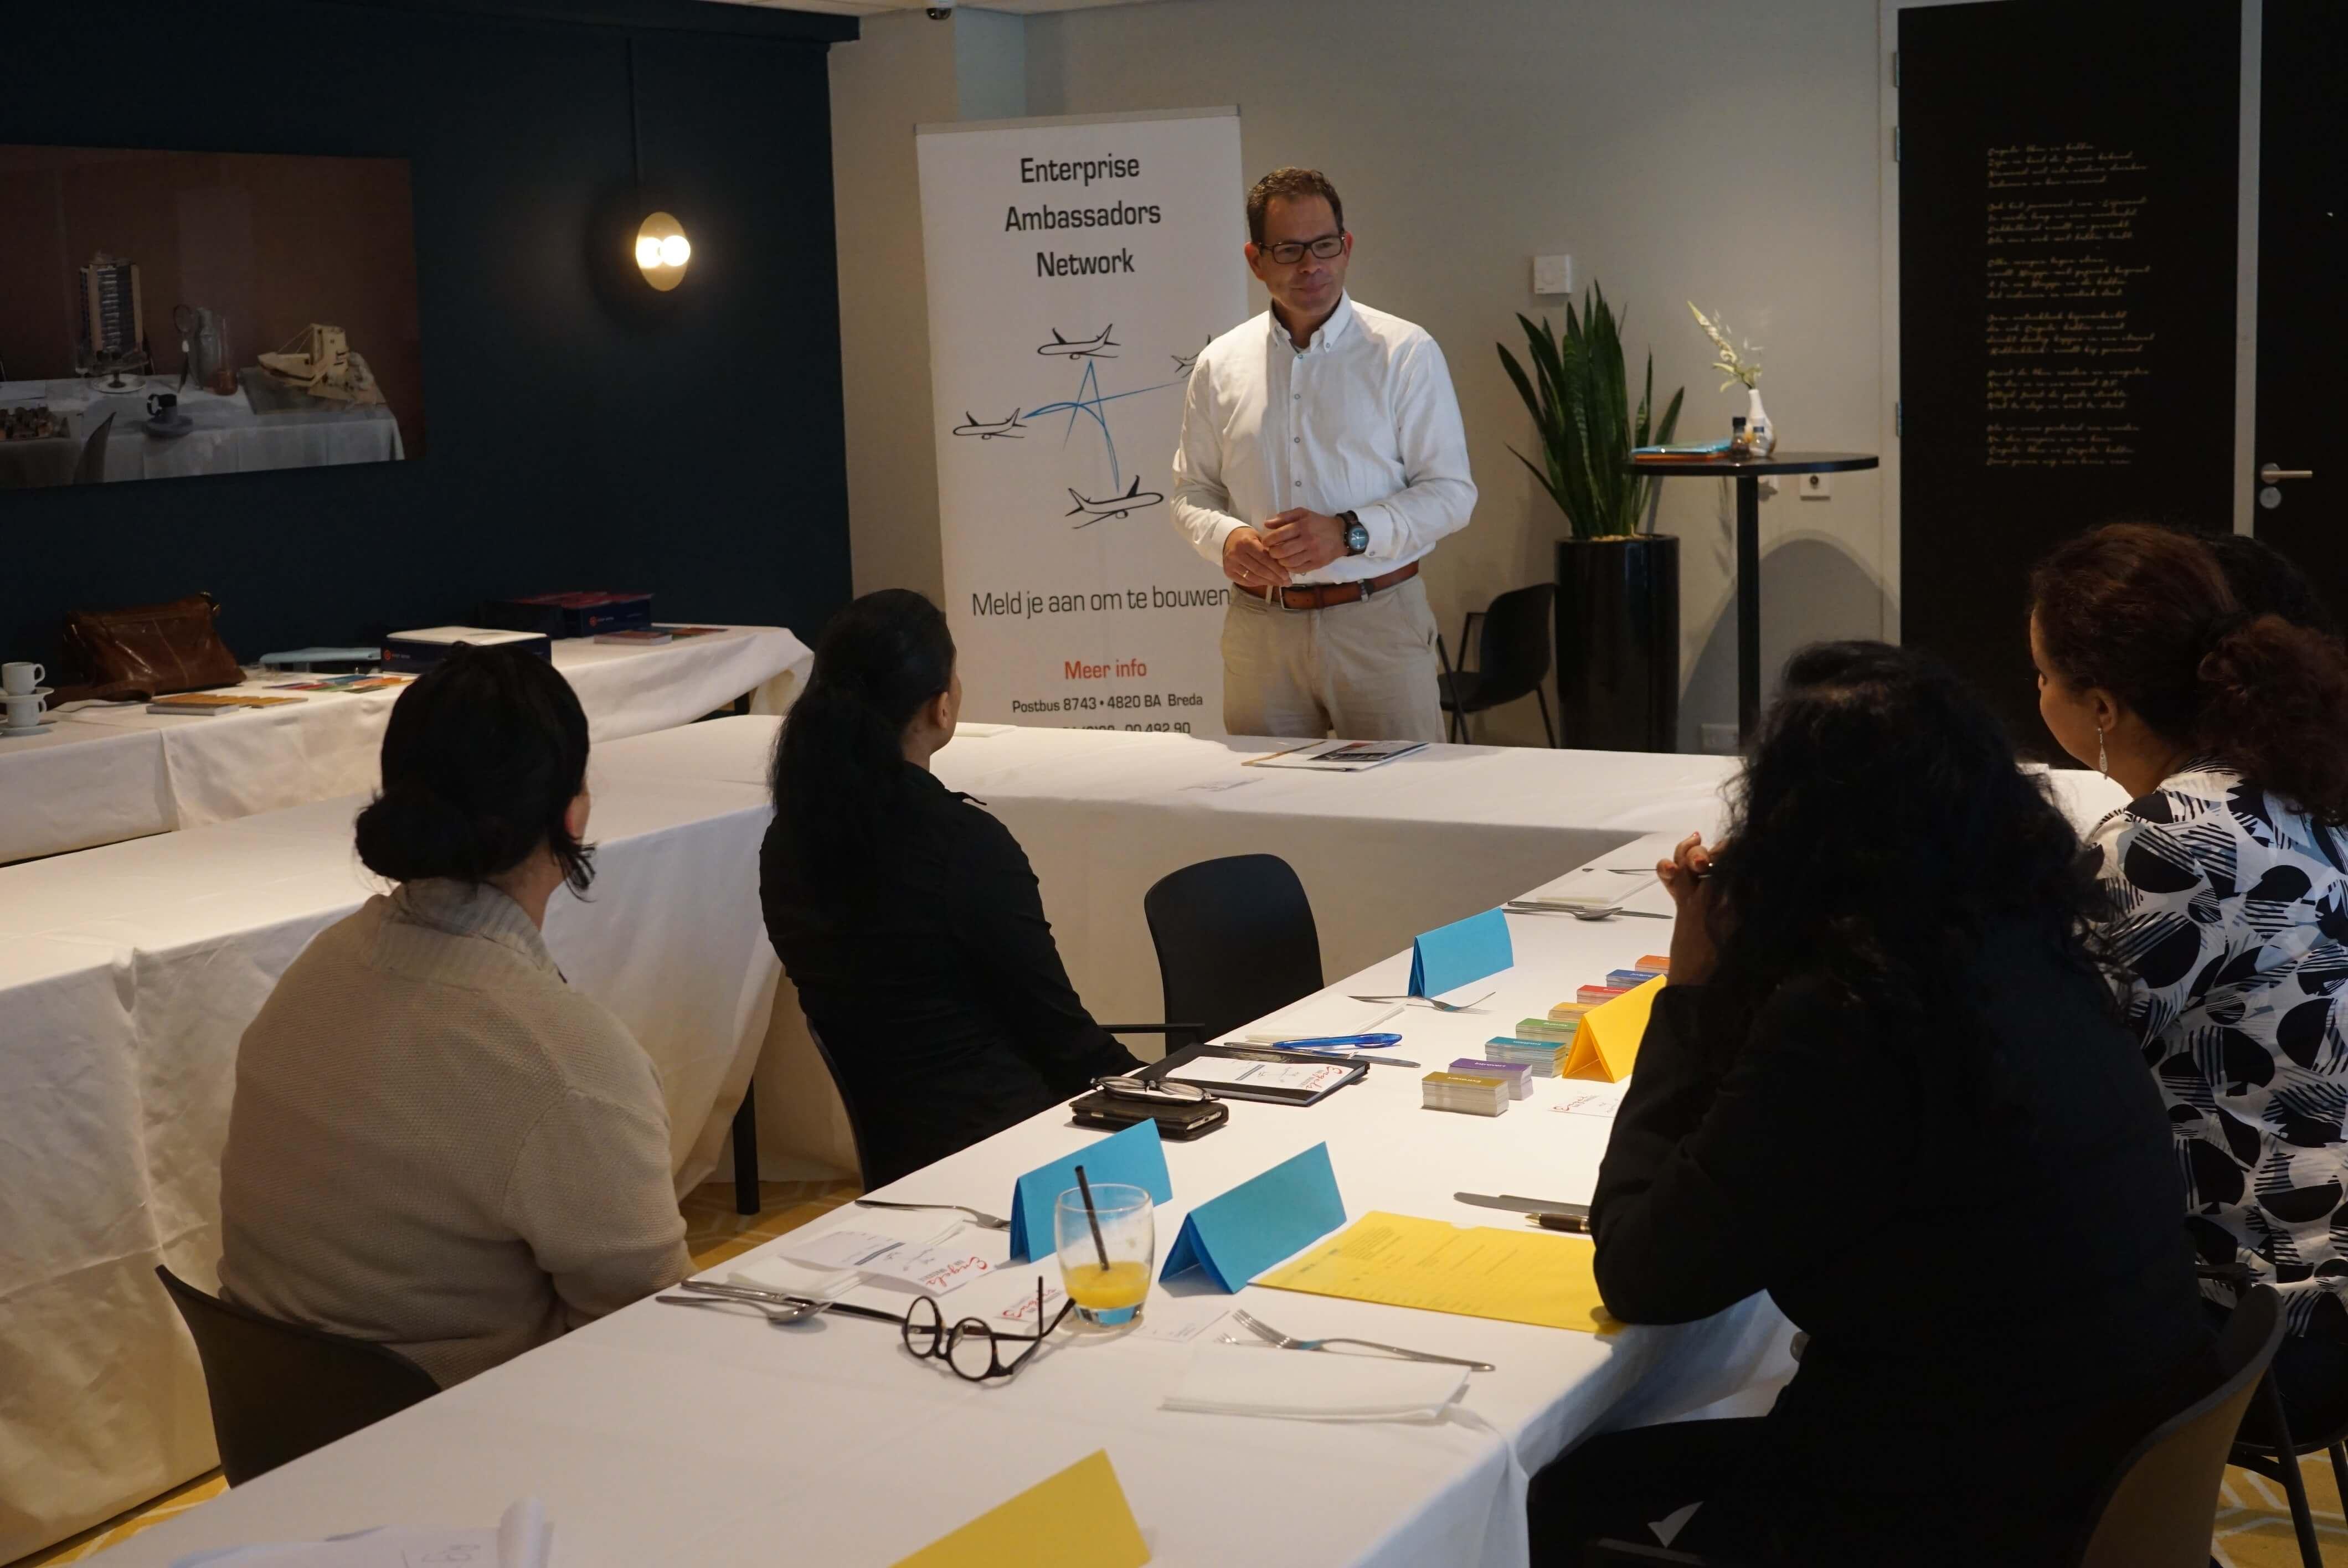 duurzaamheidstraining-enterprise-ambassadors-network-suriname